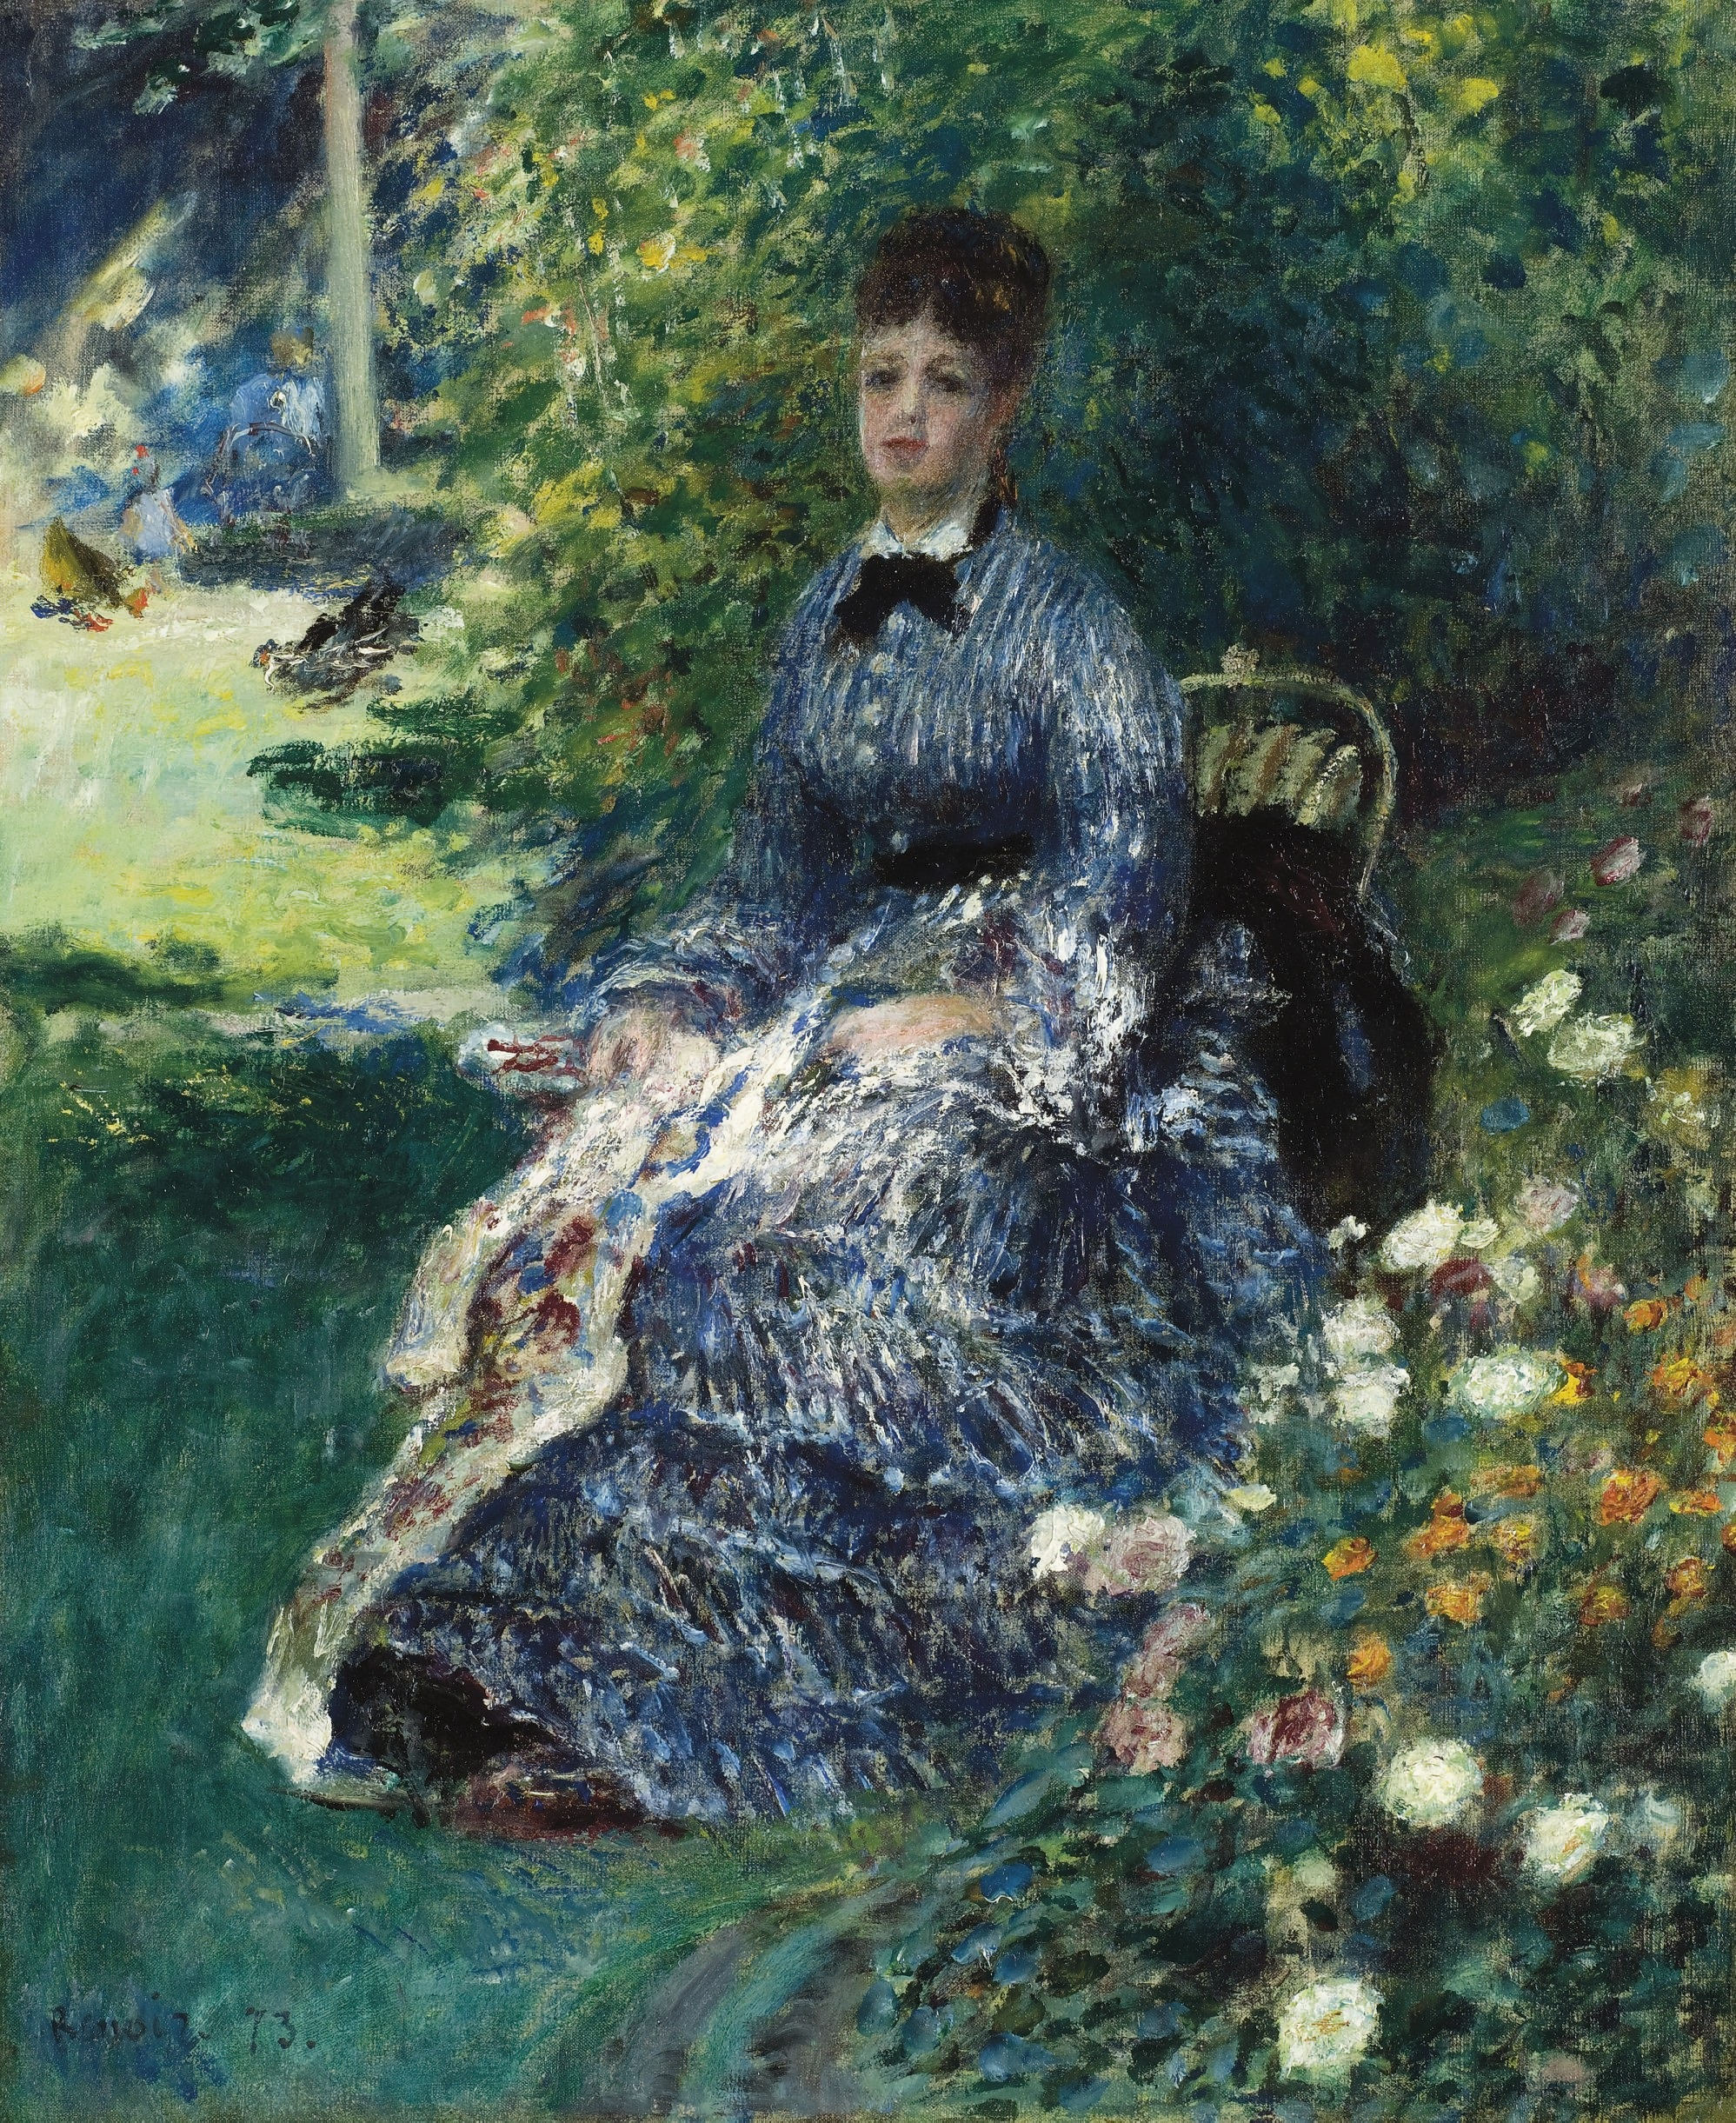 http://upload.wikimedia.org/wikipedia/commons/8/8a/%27La_tapisserie_dans_le_parc%2C_Camille_Monet%27%2C_painting_by_Renoir.jpg